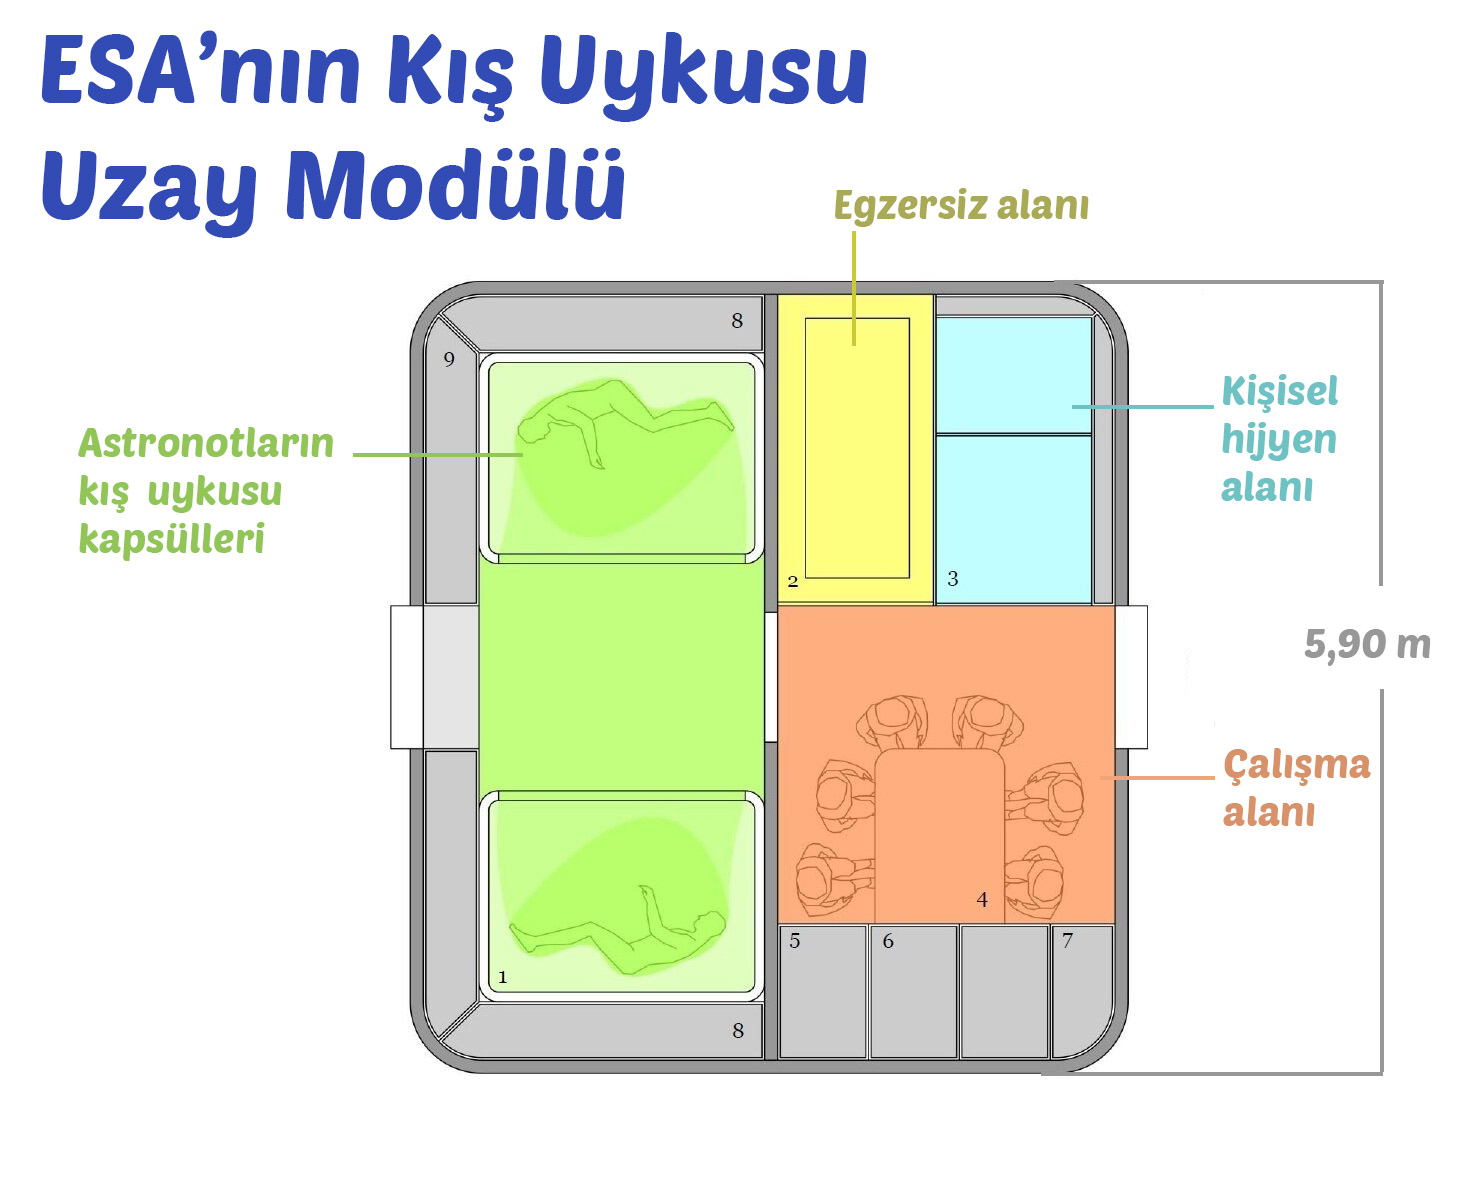 data-cke-saved-src=https://bilimgenc.tubitak.gov.tr/sites/default/files/esa_kis_uykusu_uzay_modulu_0.jpg